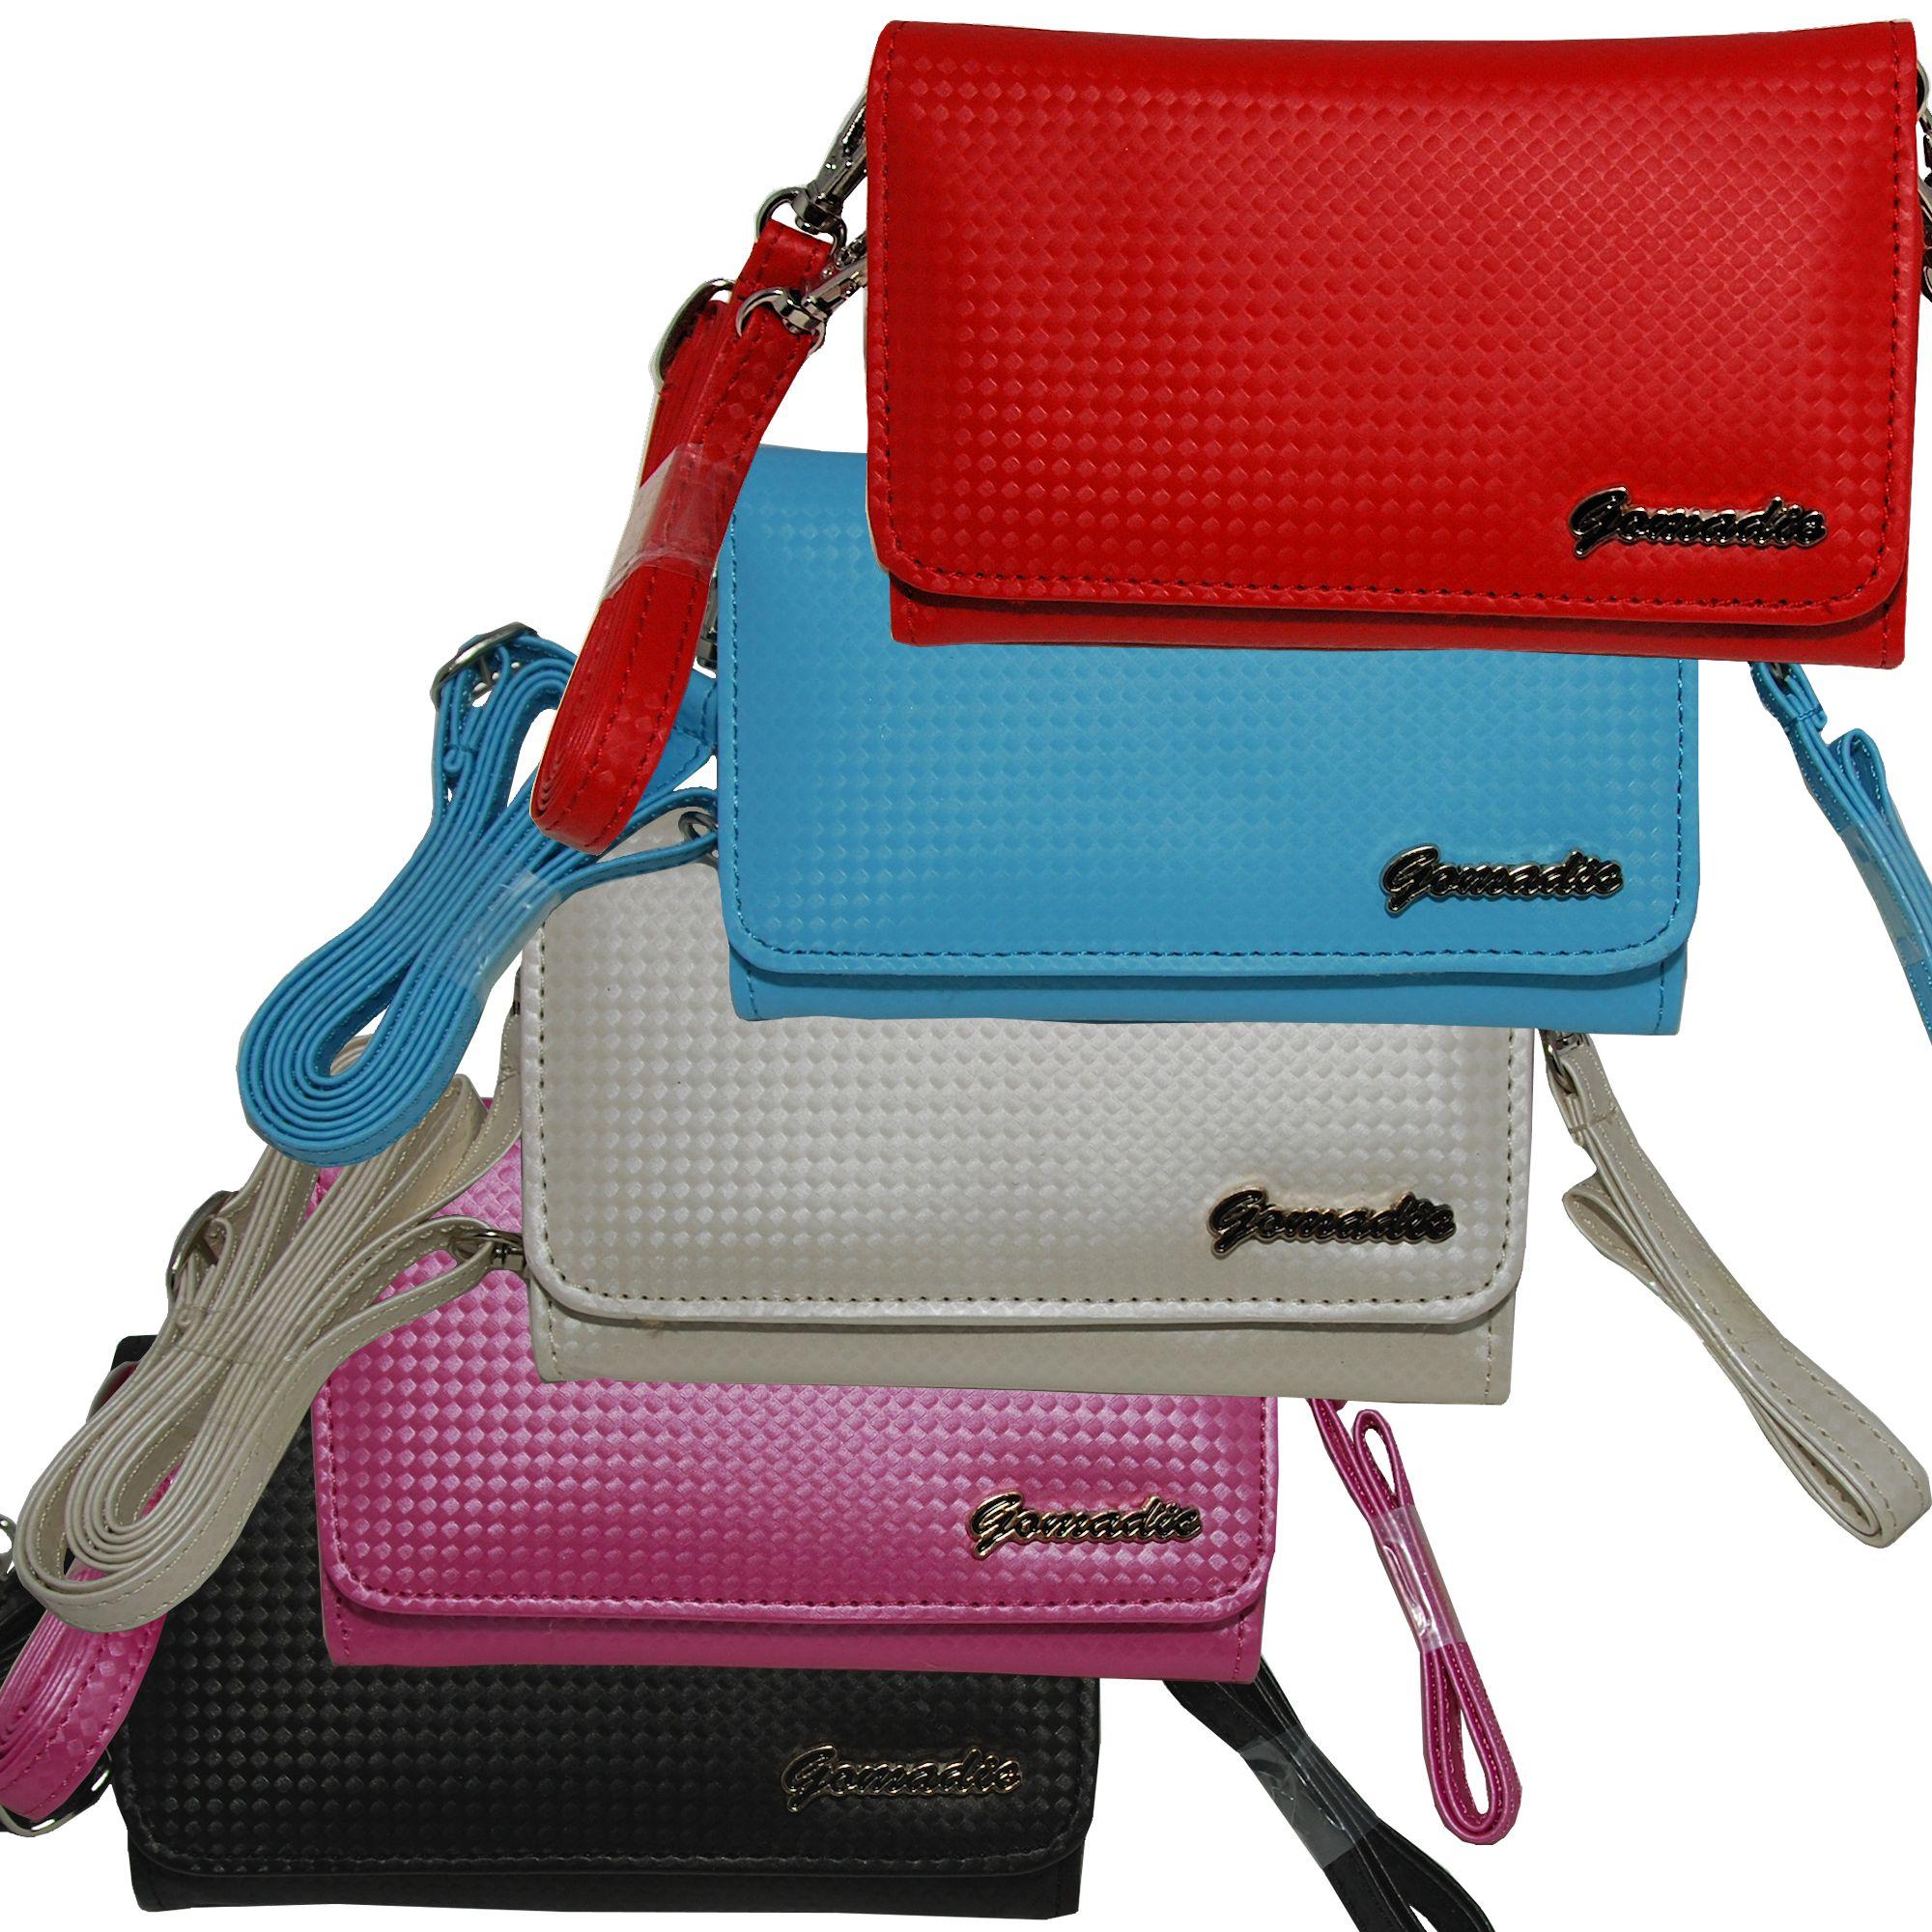 Purse Handbag Case for the Nokia 2865i 3155i  - Color Options Blue Pink White Black and Red